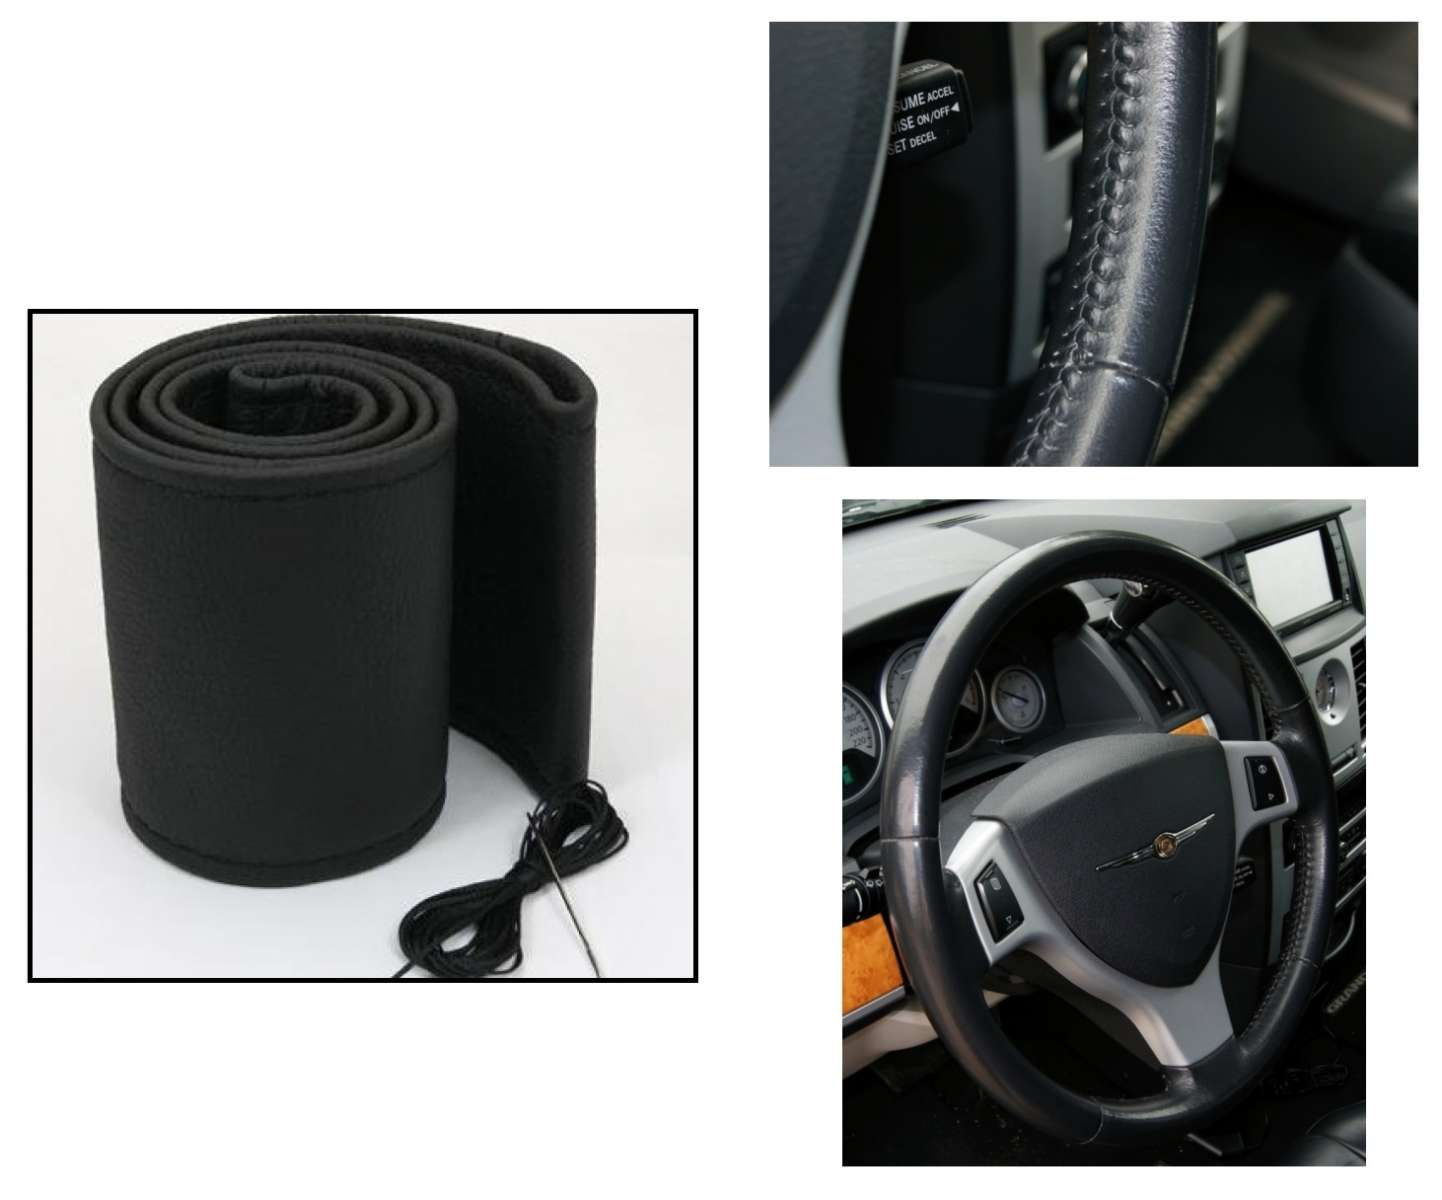 Potah volantu omotávací kožený černý 37-38cm a obvod věnce 9,7-10,4cm